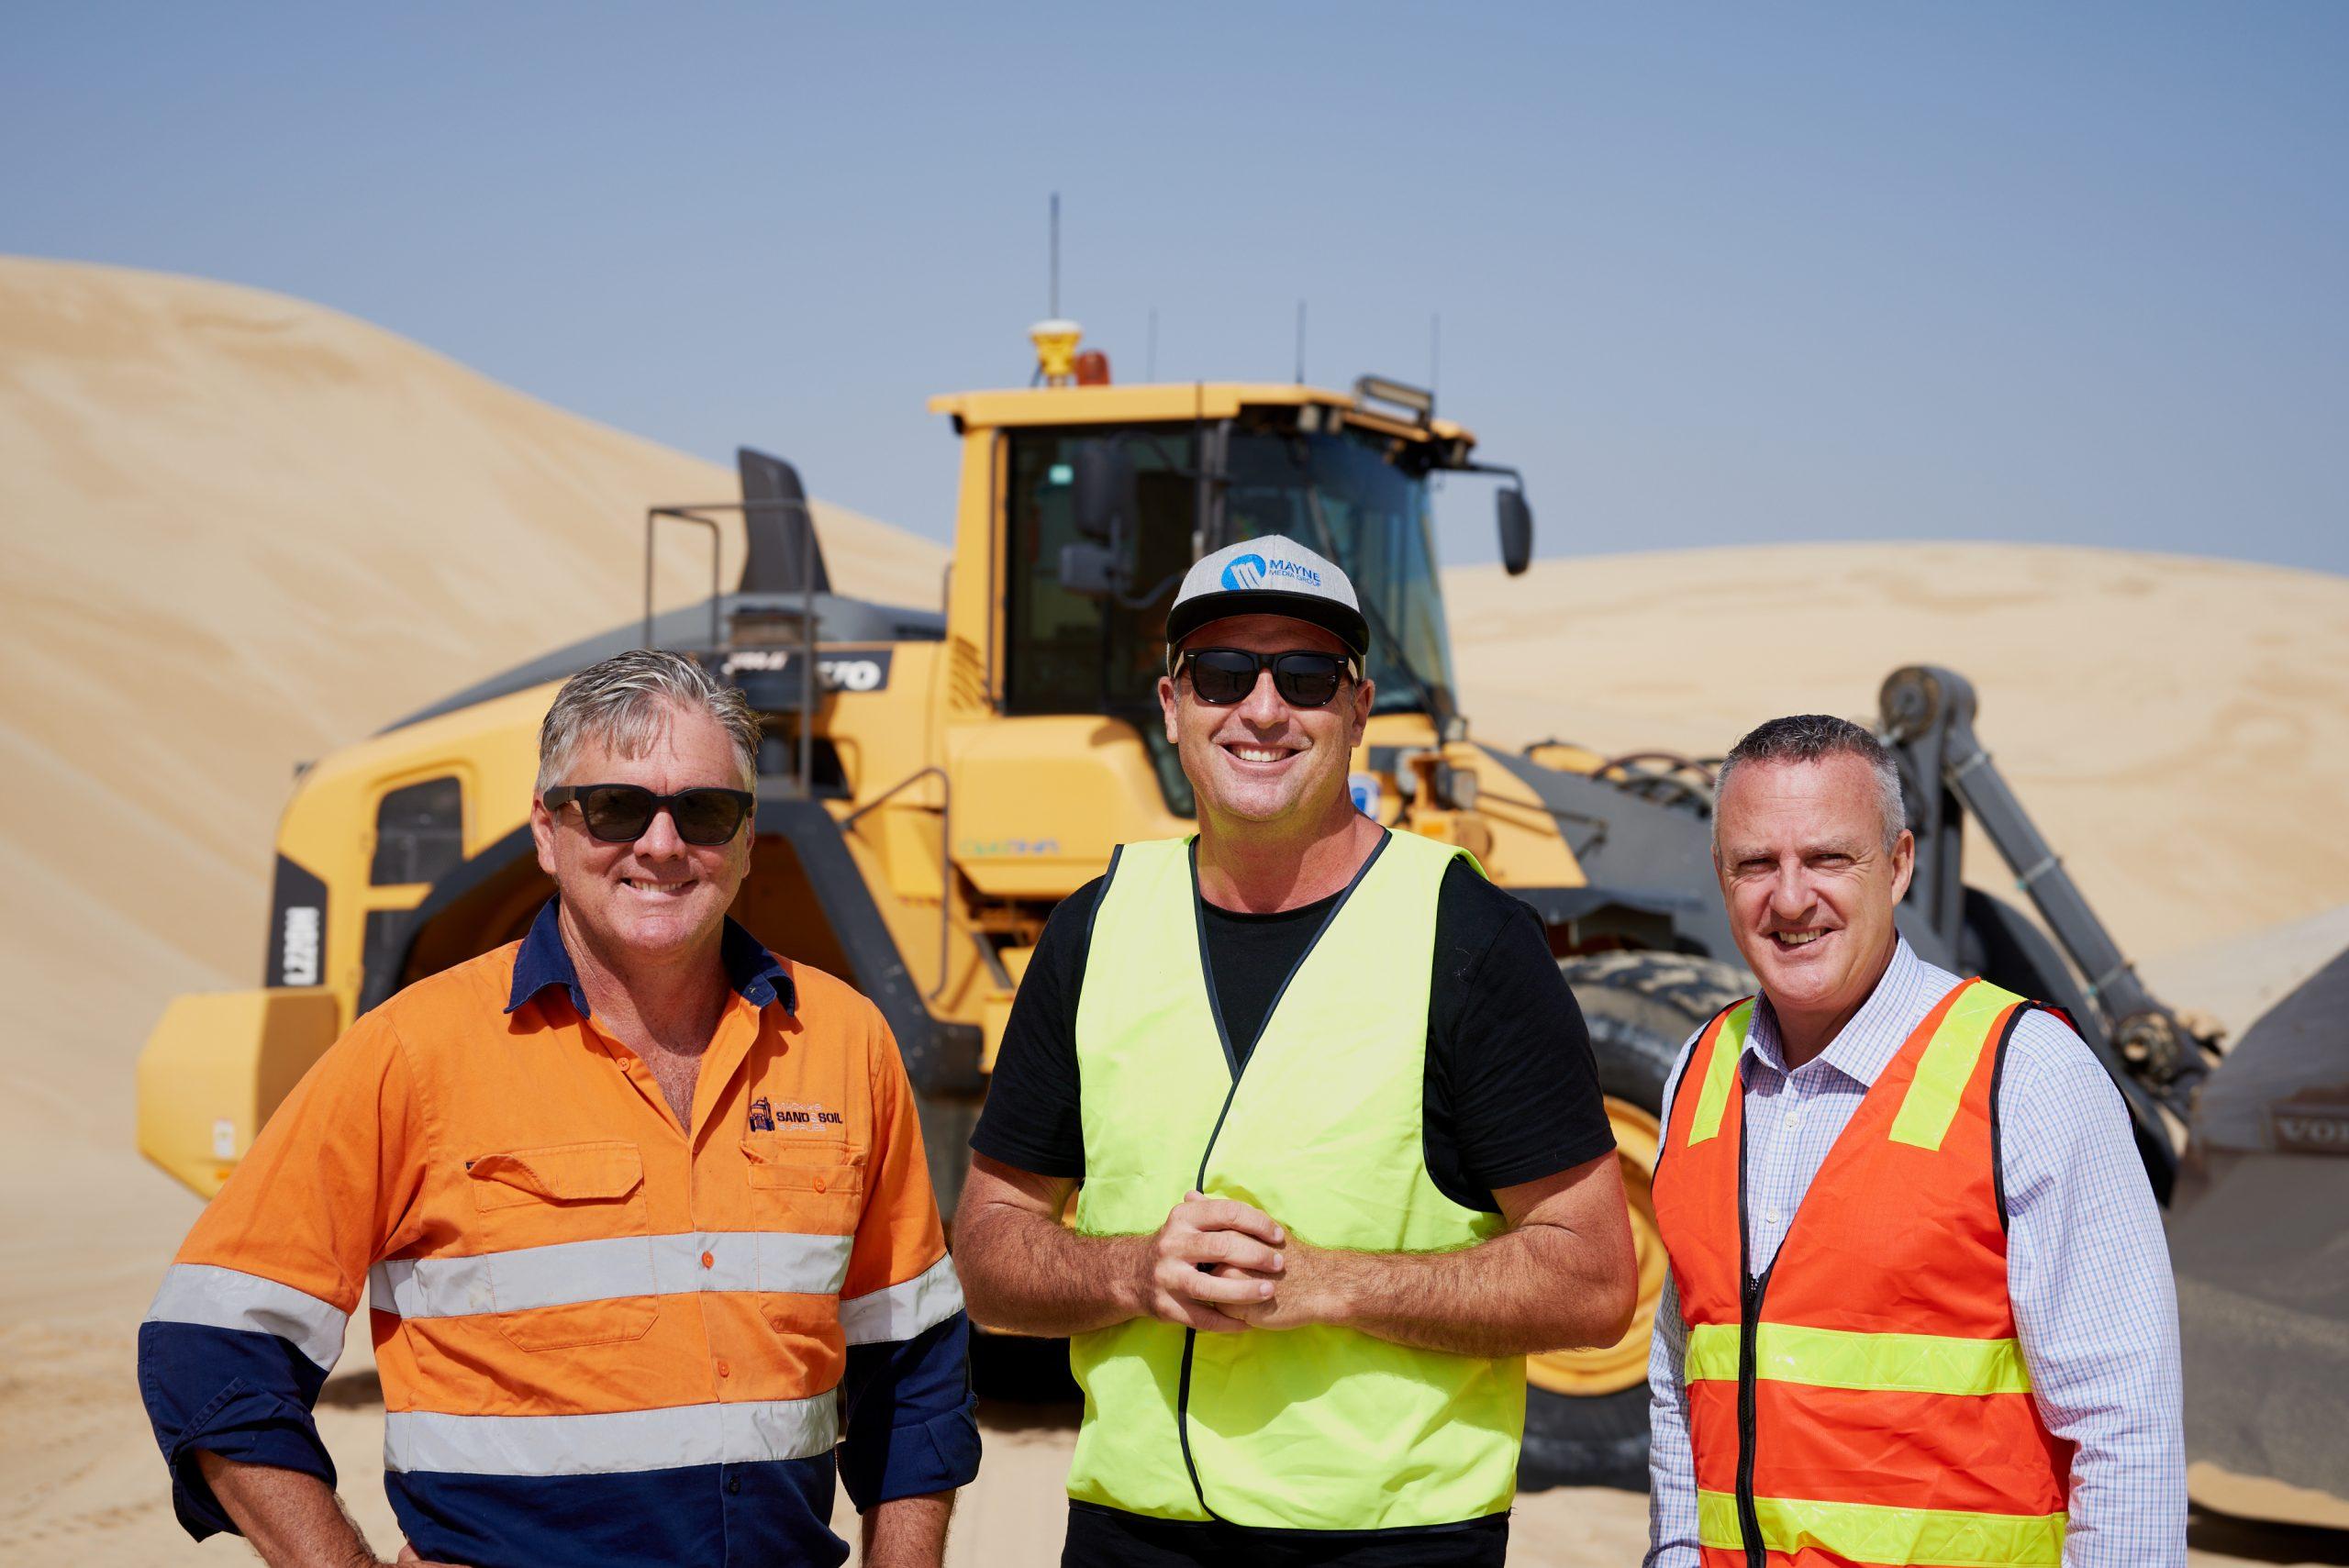 Macka's Sand & Soil Supplies and CJD Equipment 1